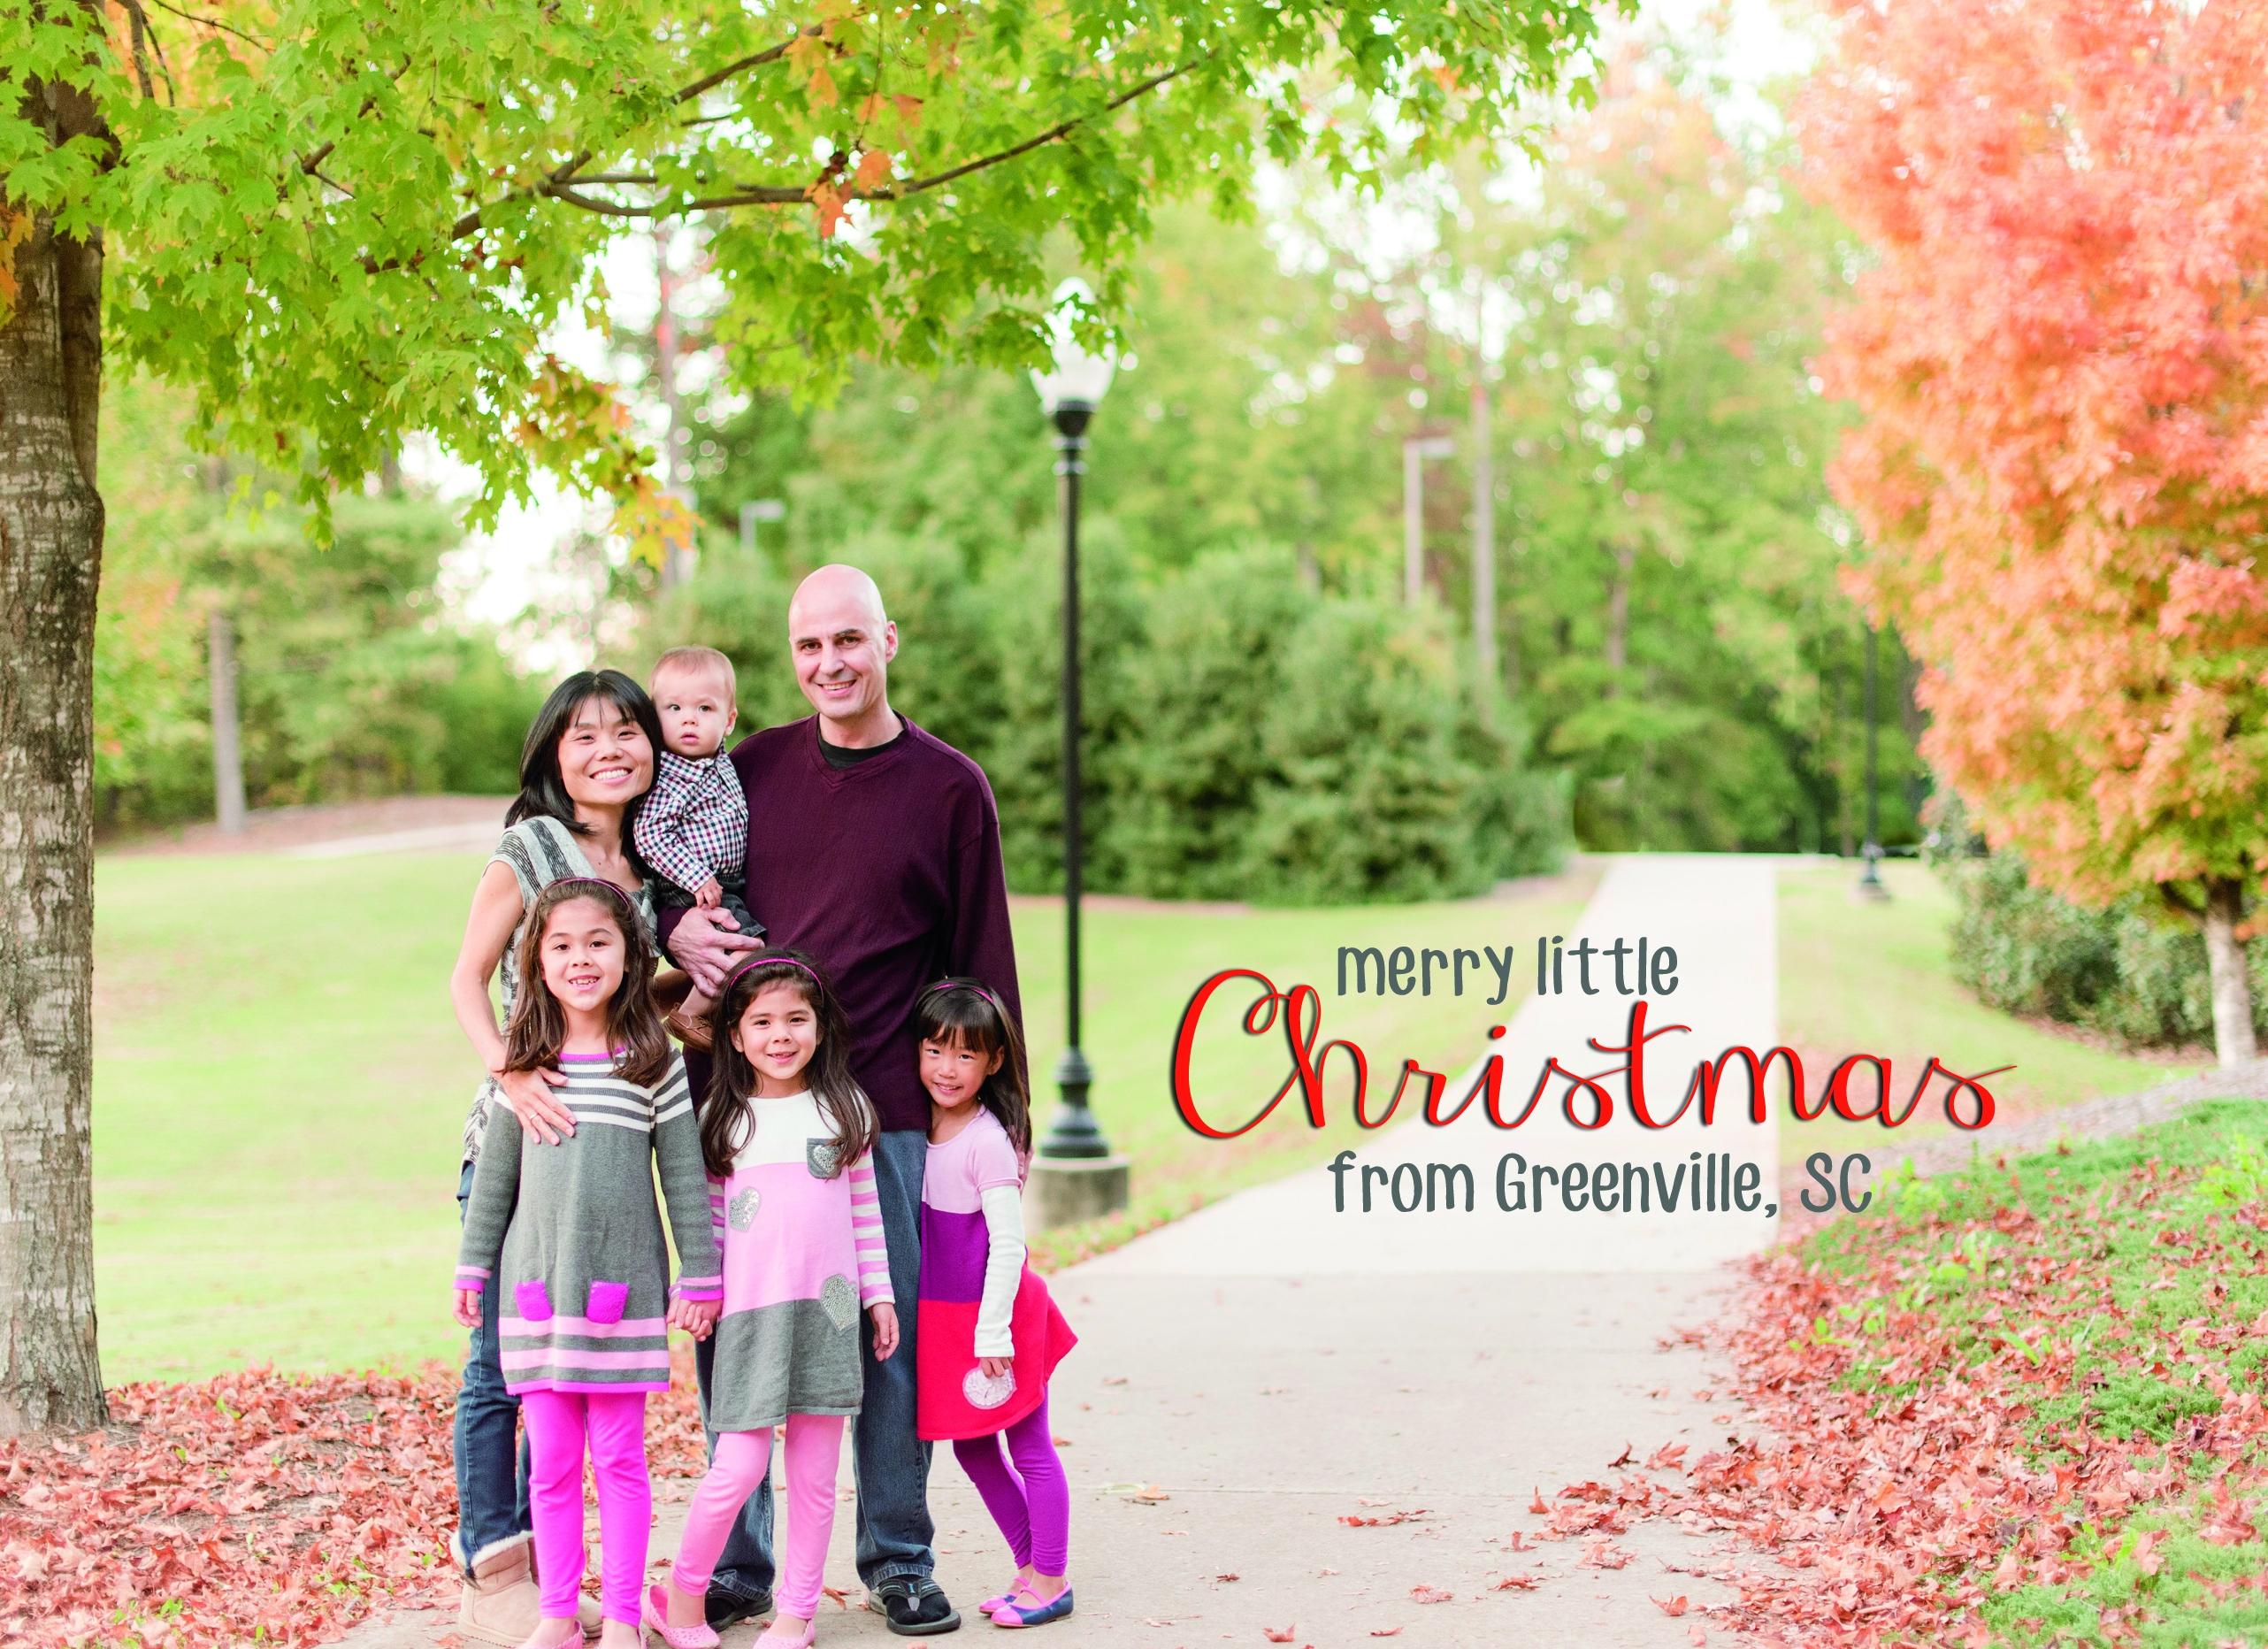 Annual Christmas Cards